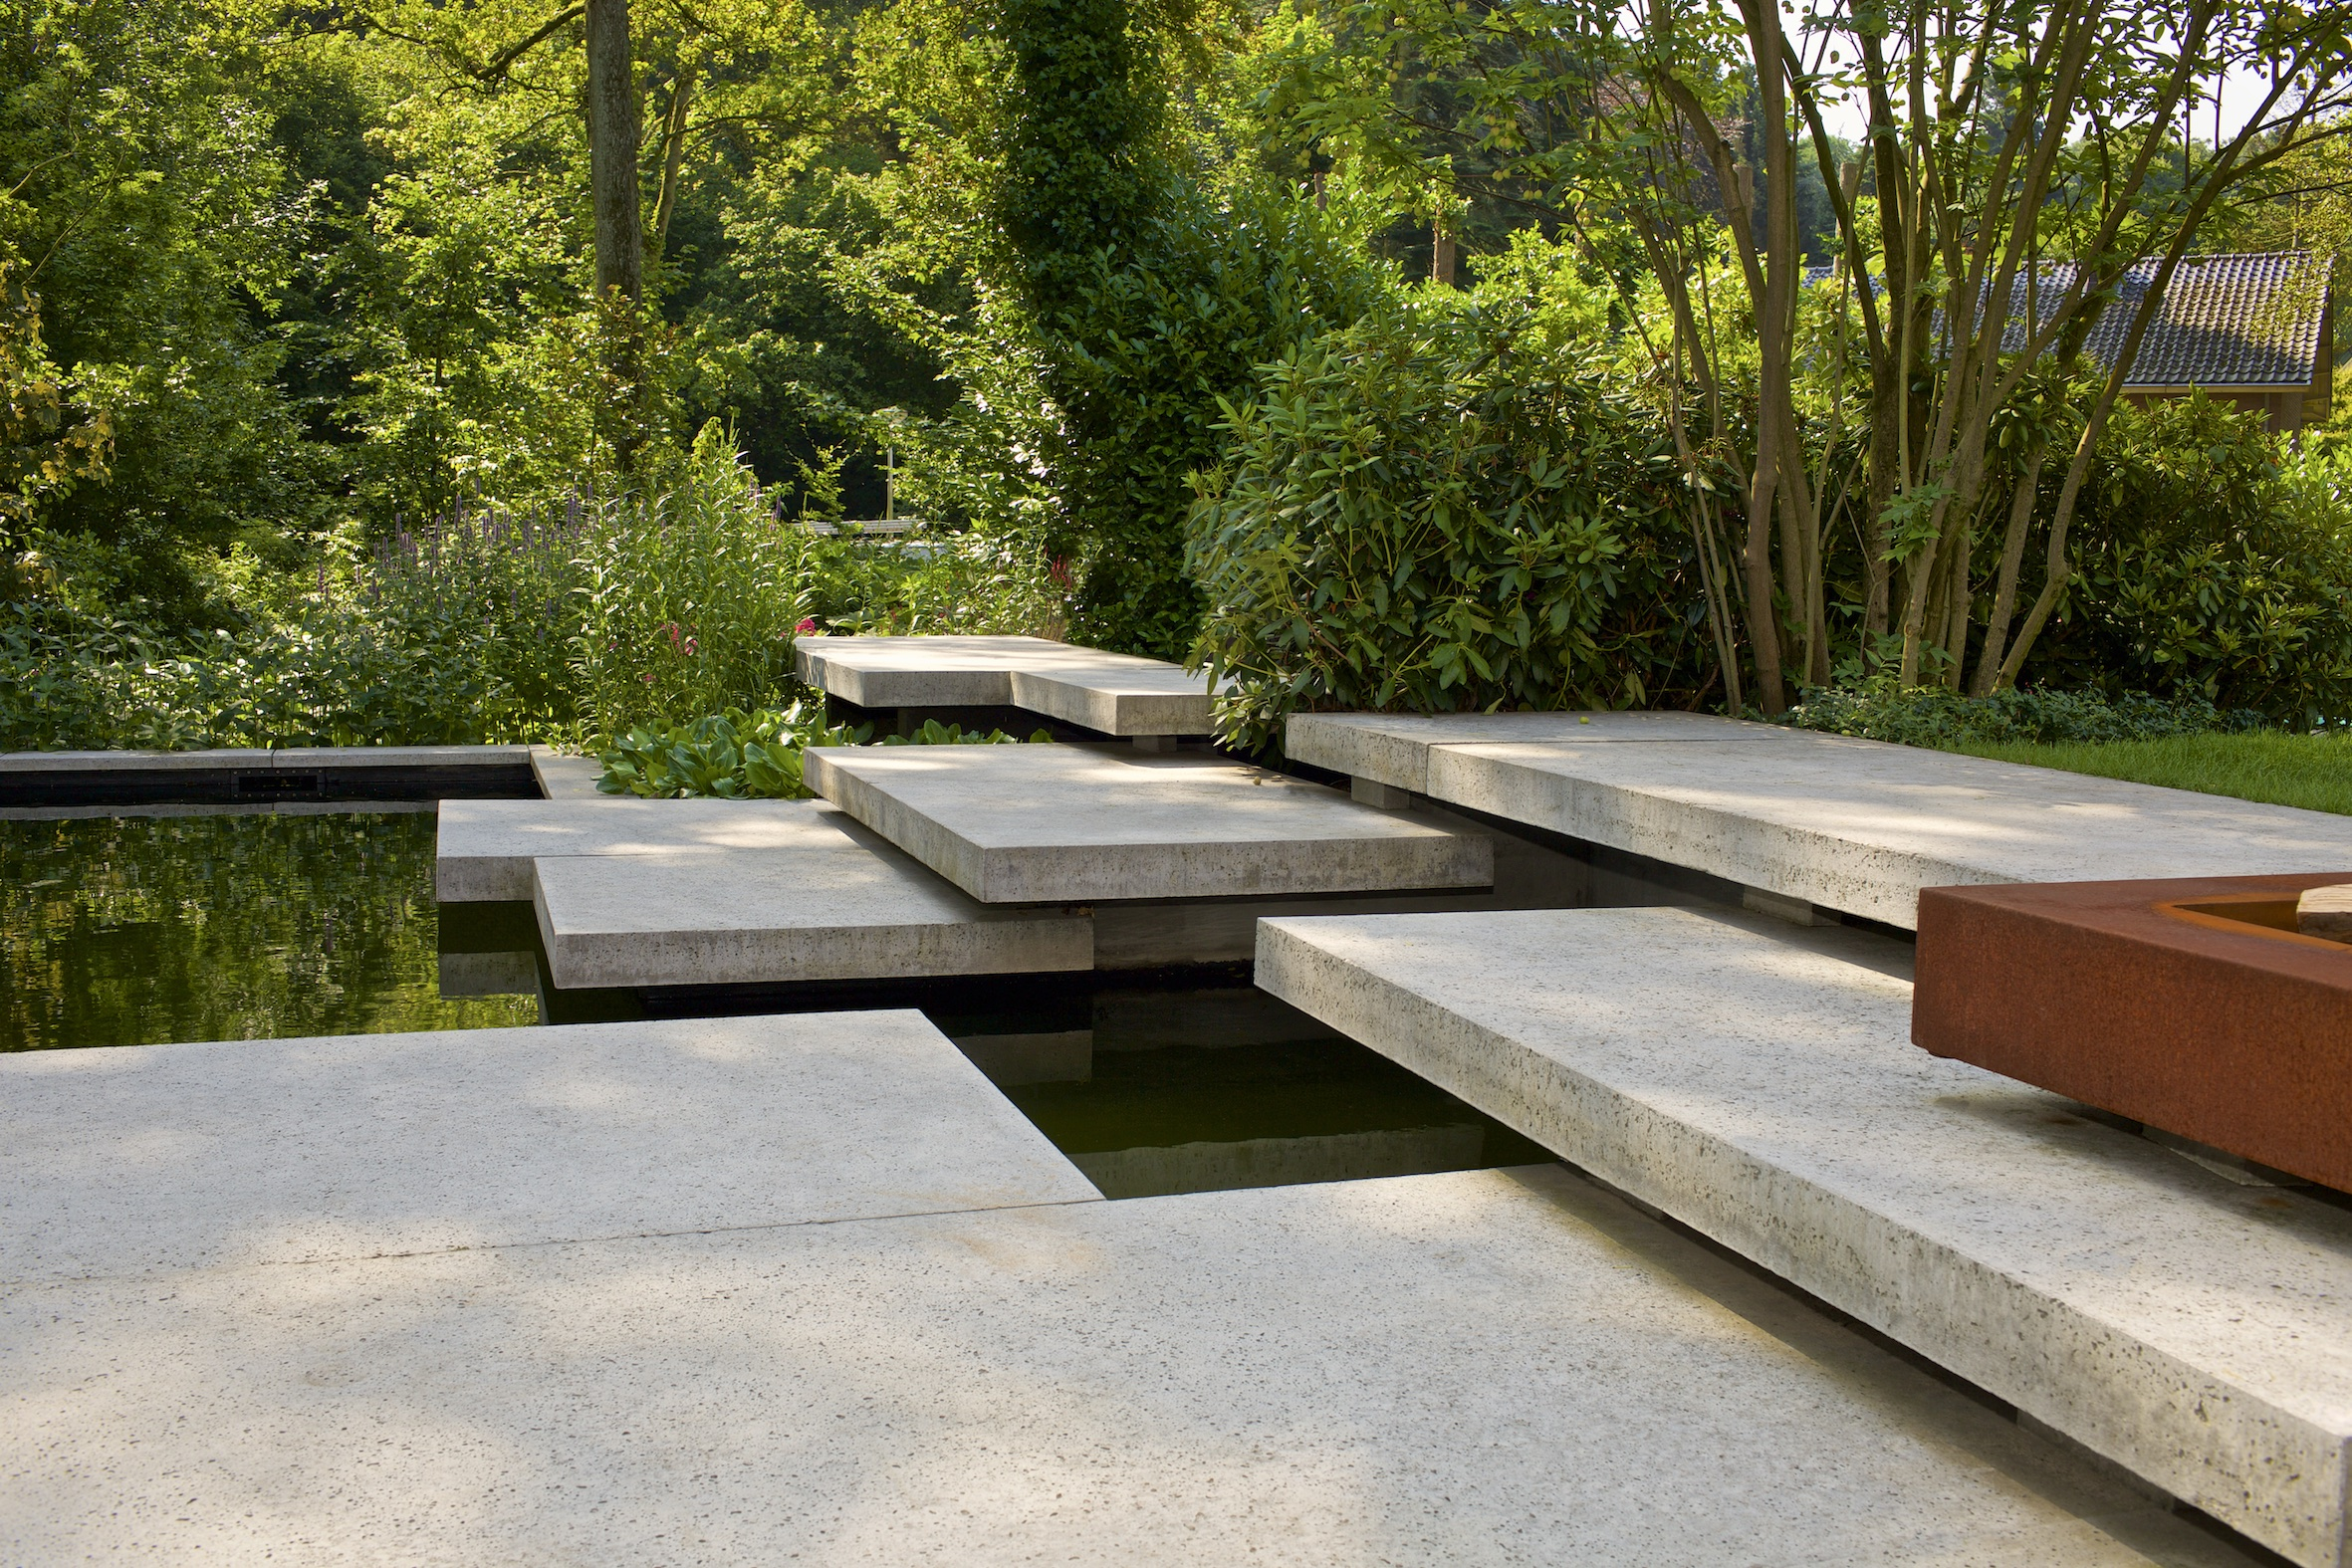 Neerlands mooiste tuin komt van hovenier sterk en ligt in beek